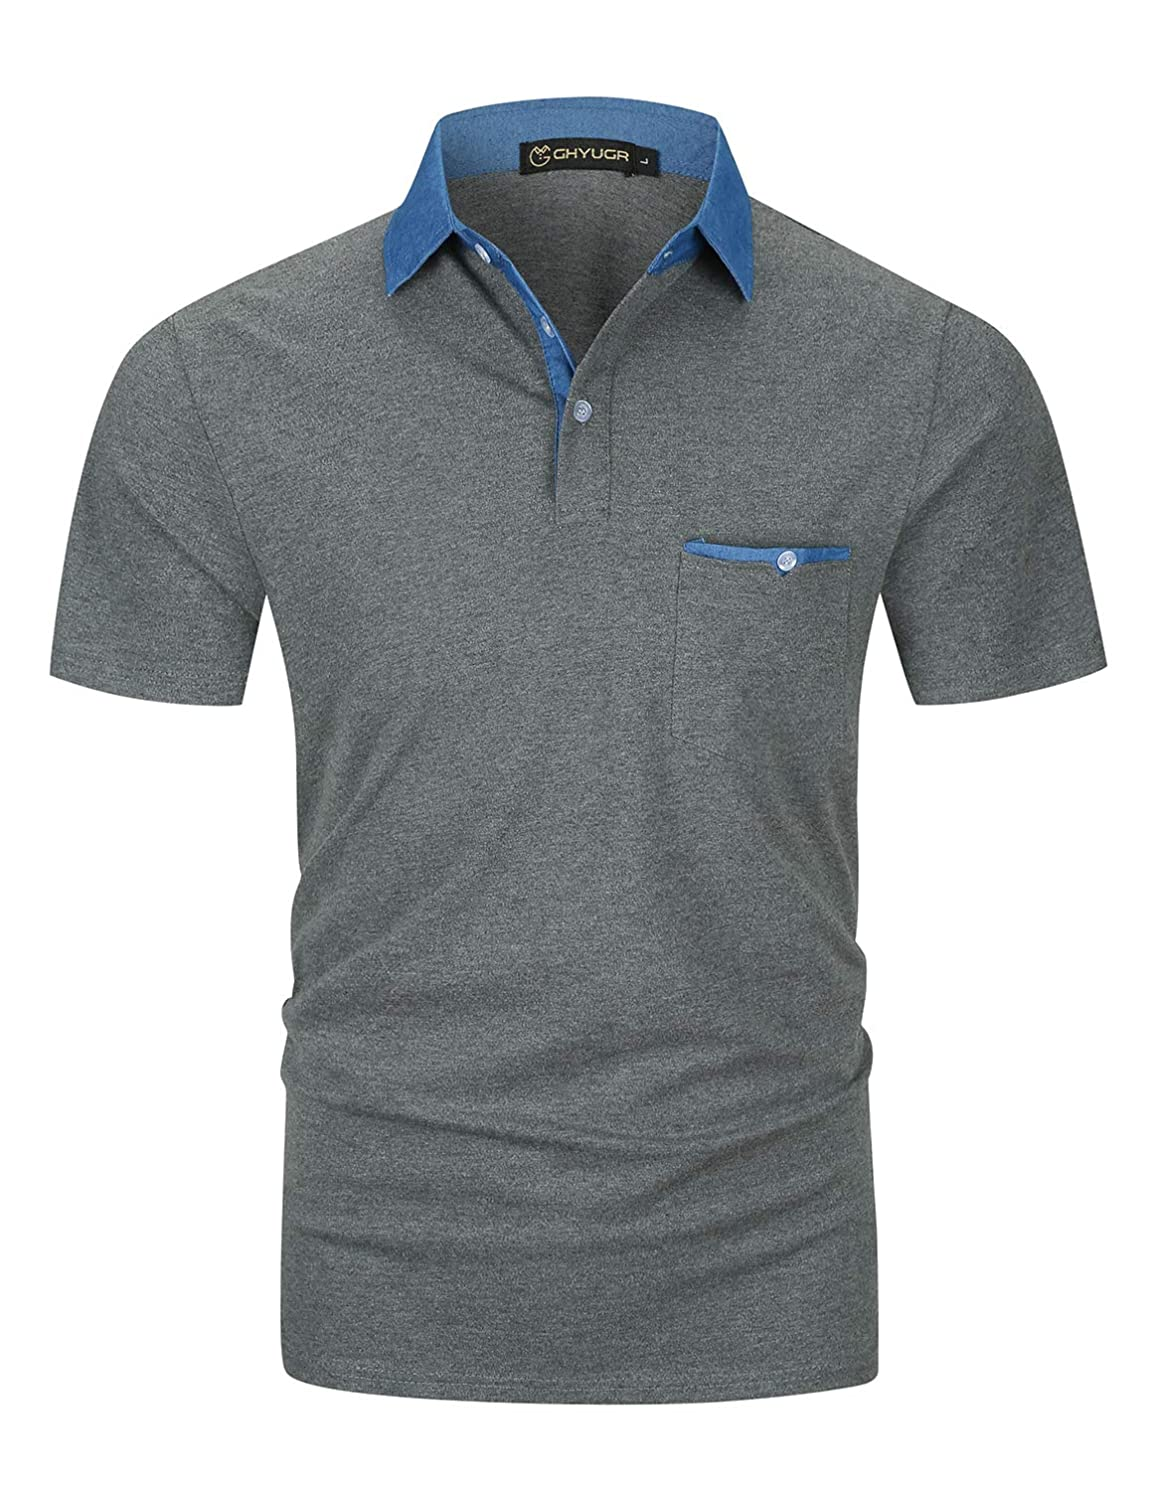 GHYUGR Men's Short Sleeve Poloshirts Denim Splice Cotton Golf T-Shirt Casual Polos Tops